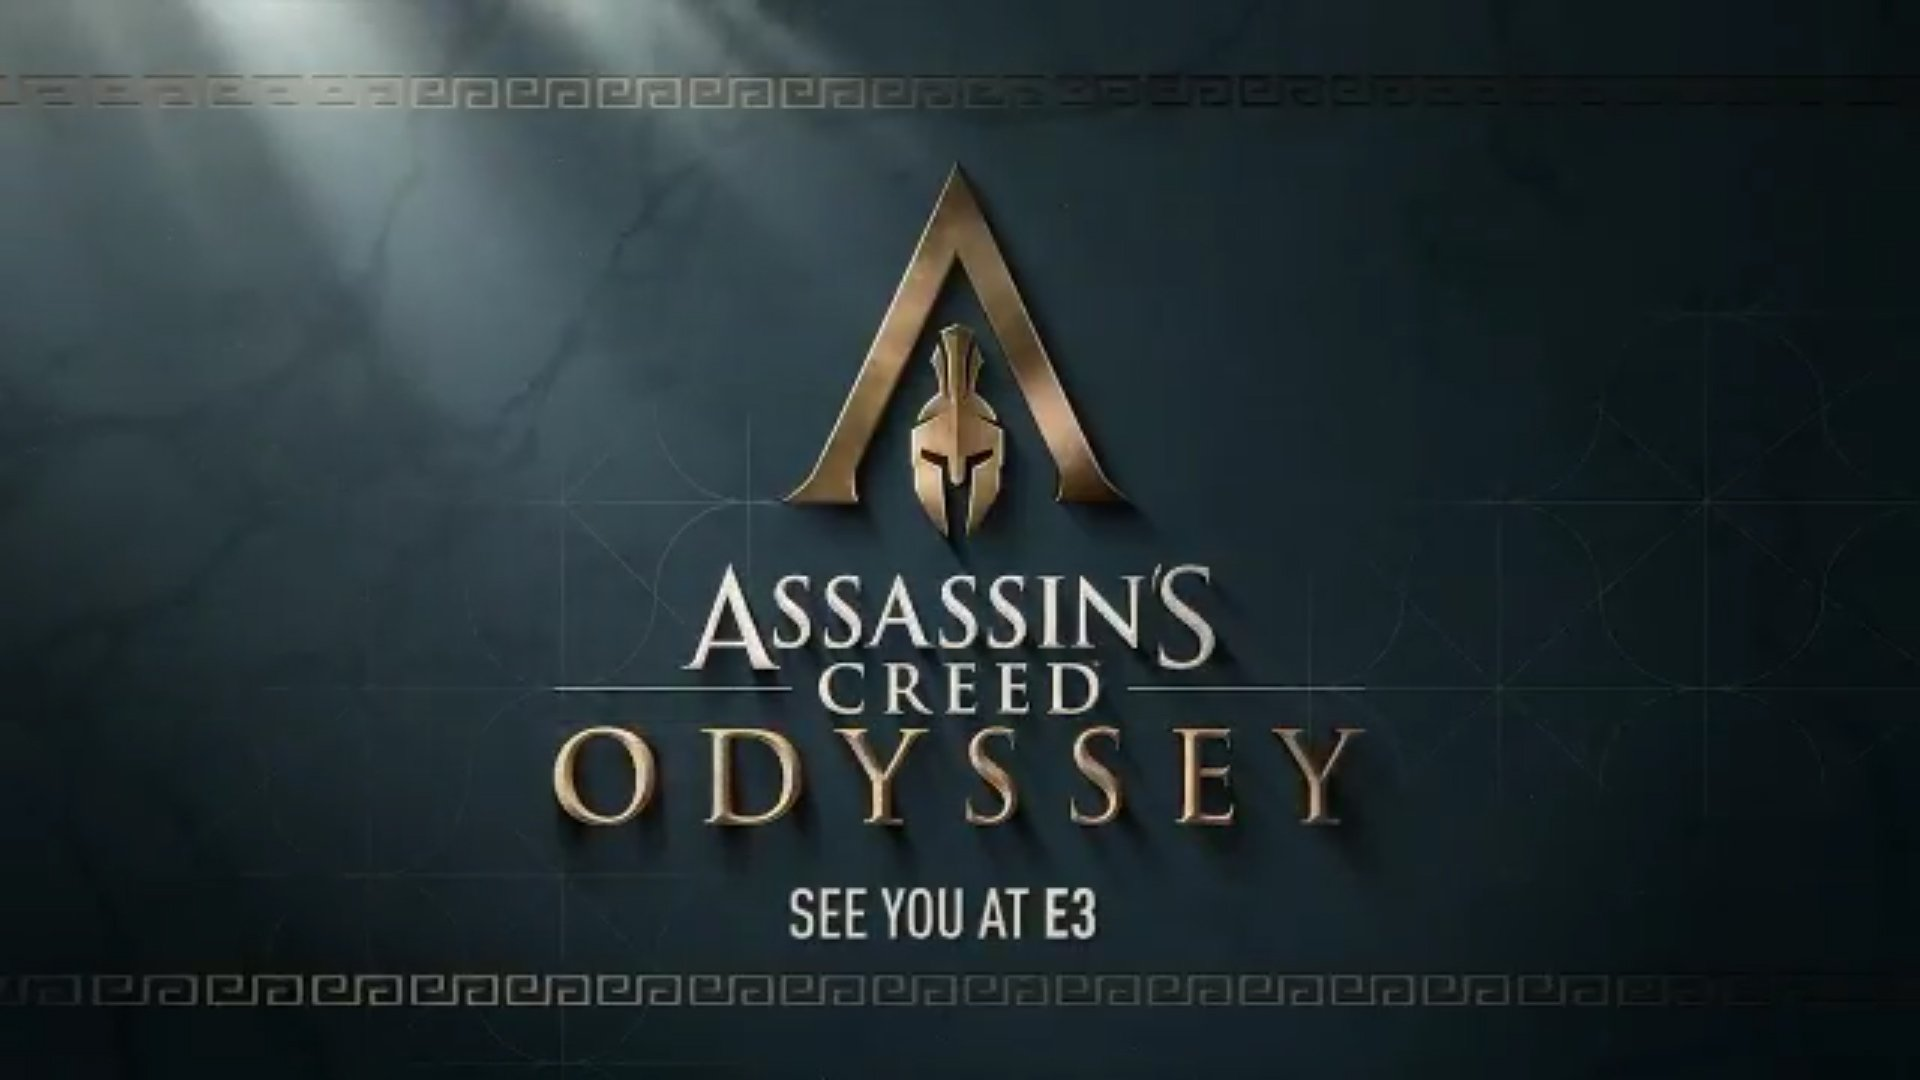 Ubisoft confirms Assassin's Creed Odyssey screenshot